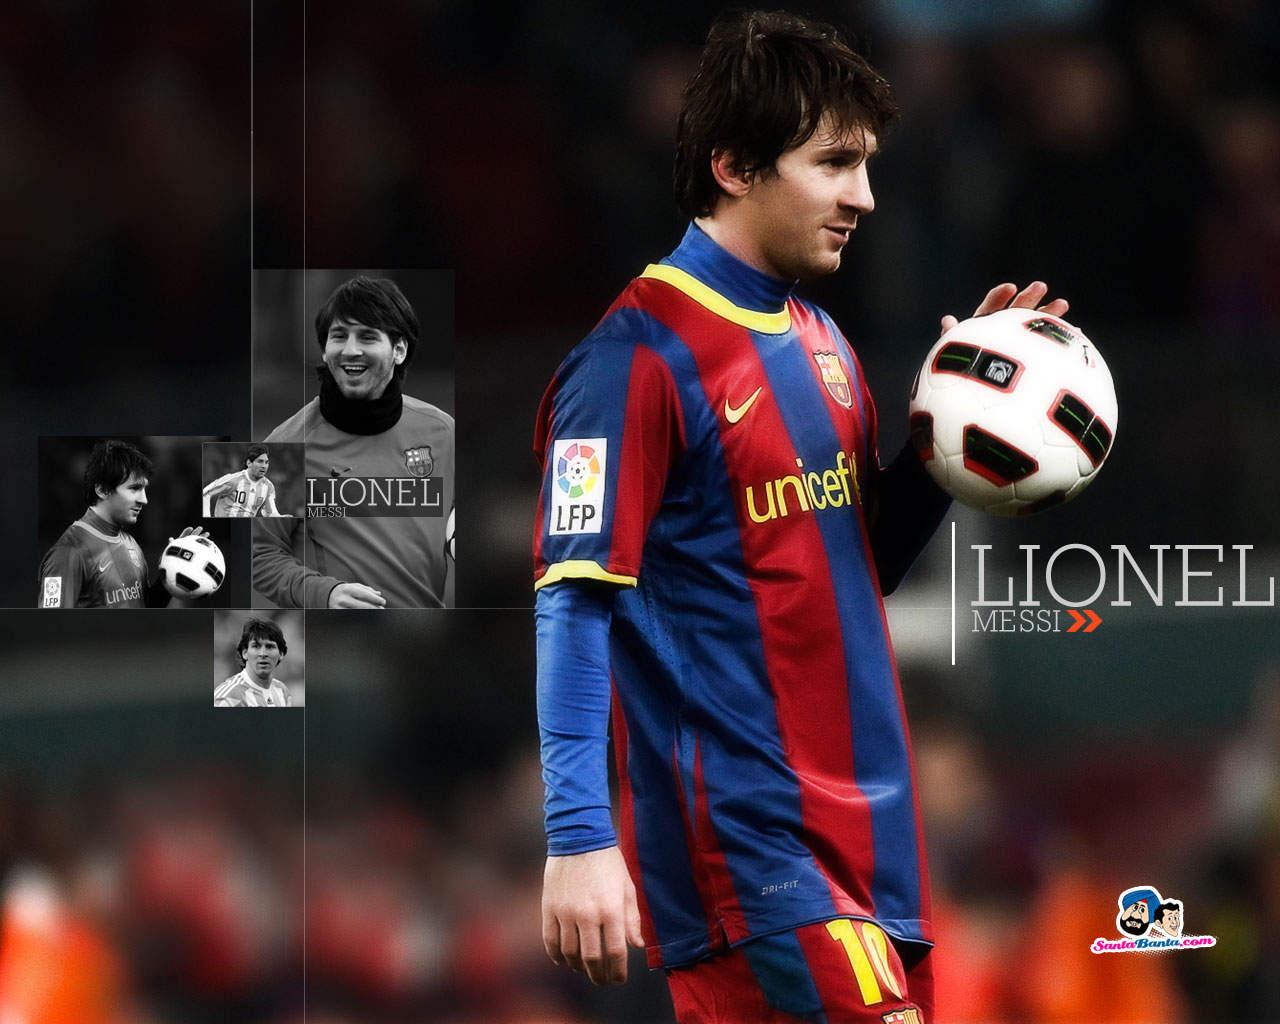 Messi Wallpaper Download HD Wallpapers 1280x1024